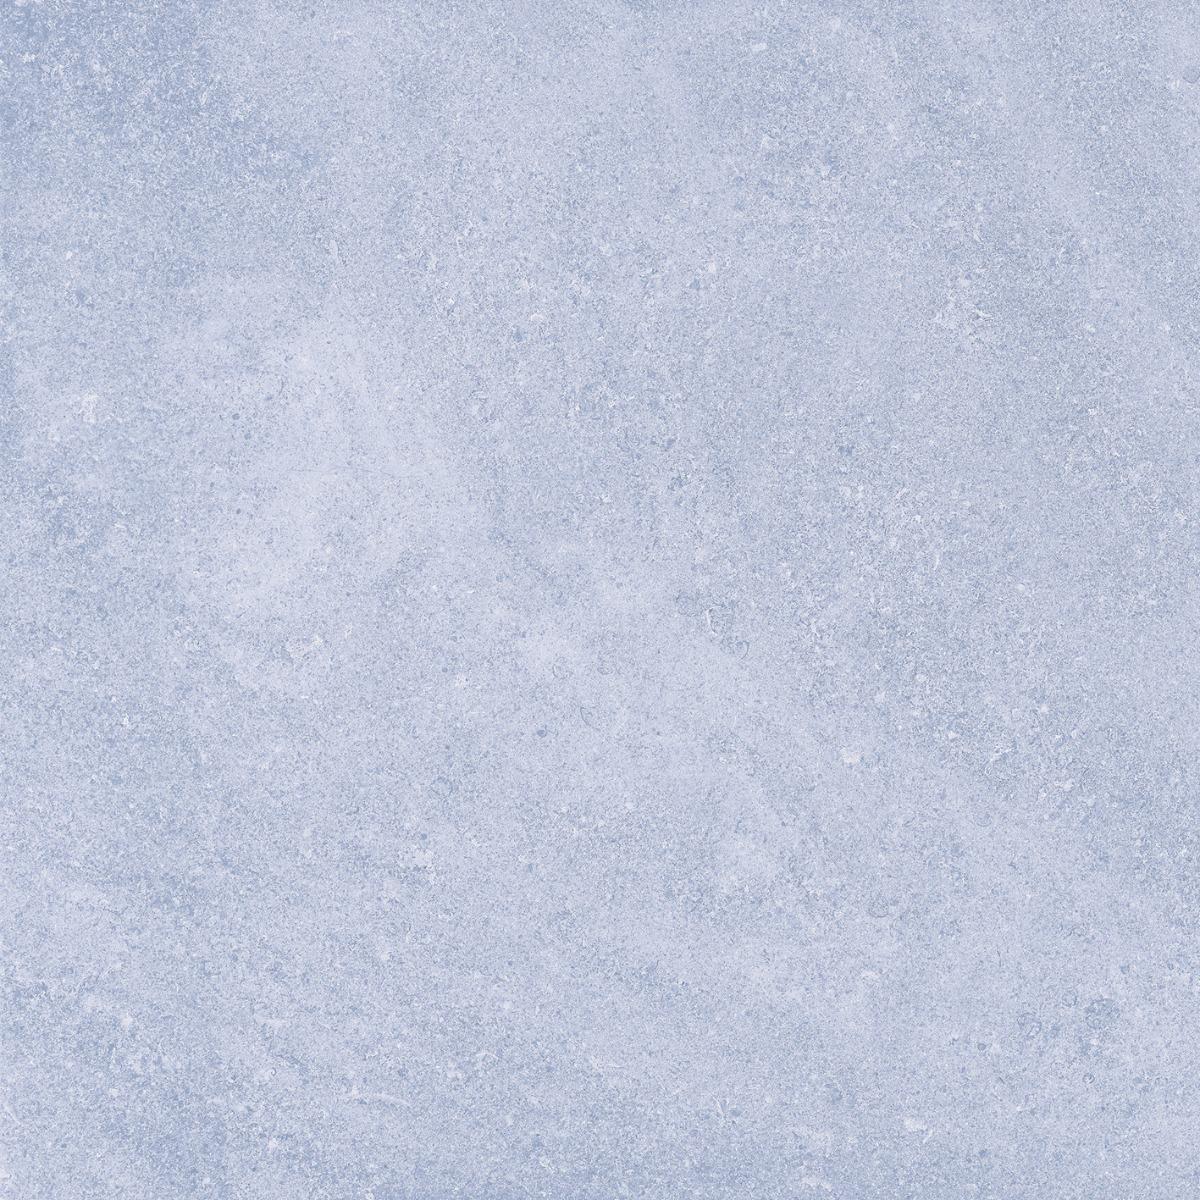 GFT BDF Cemento LT Blue